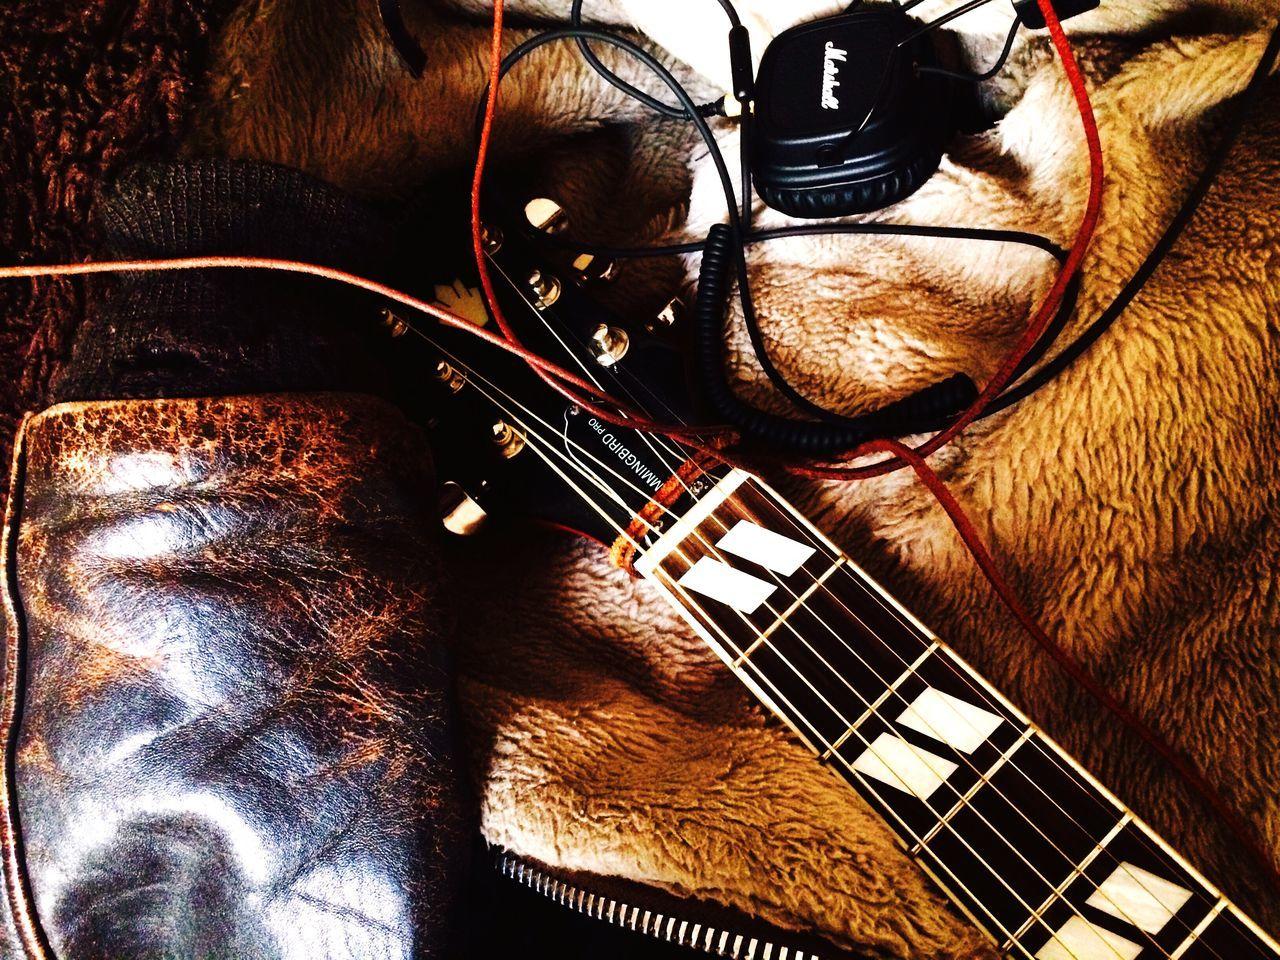 Guitar stills Indoors  Music Leather Jacket brown